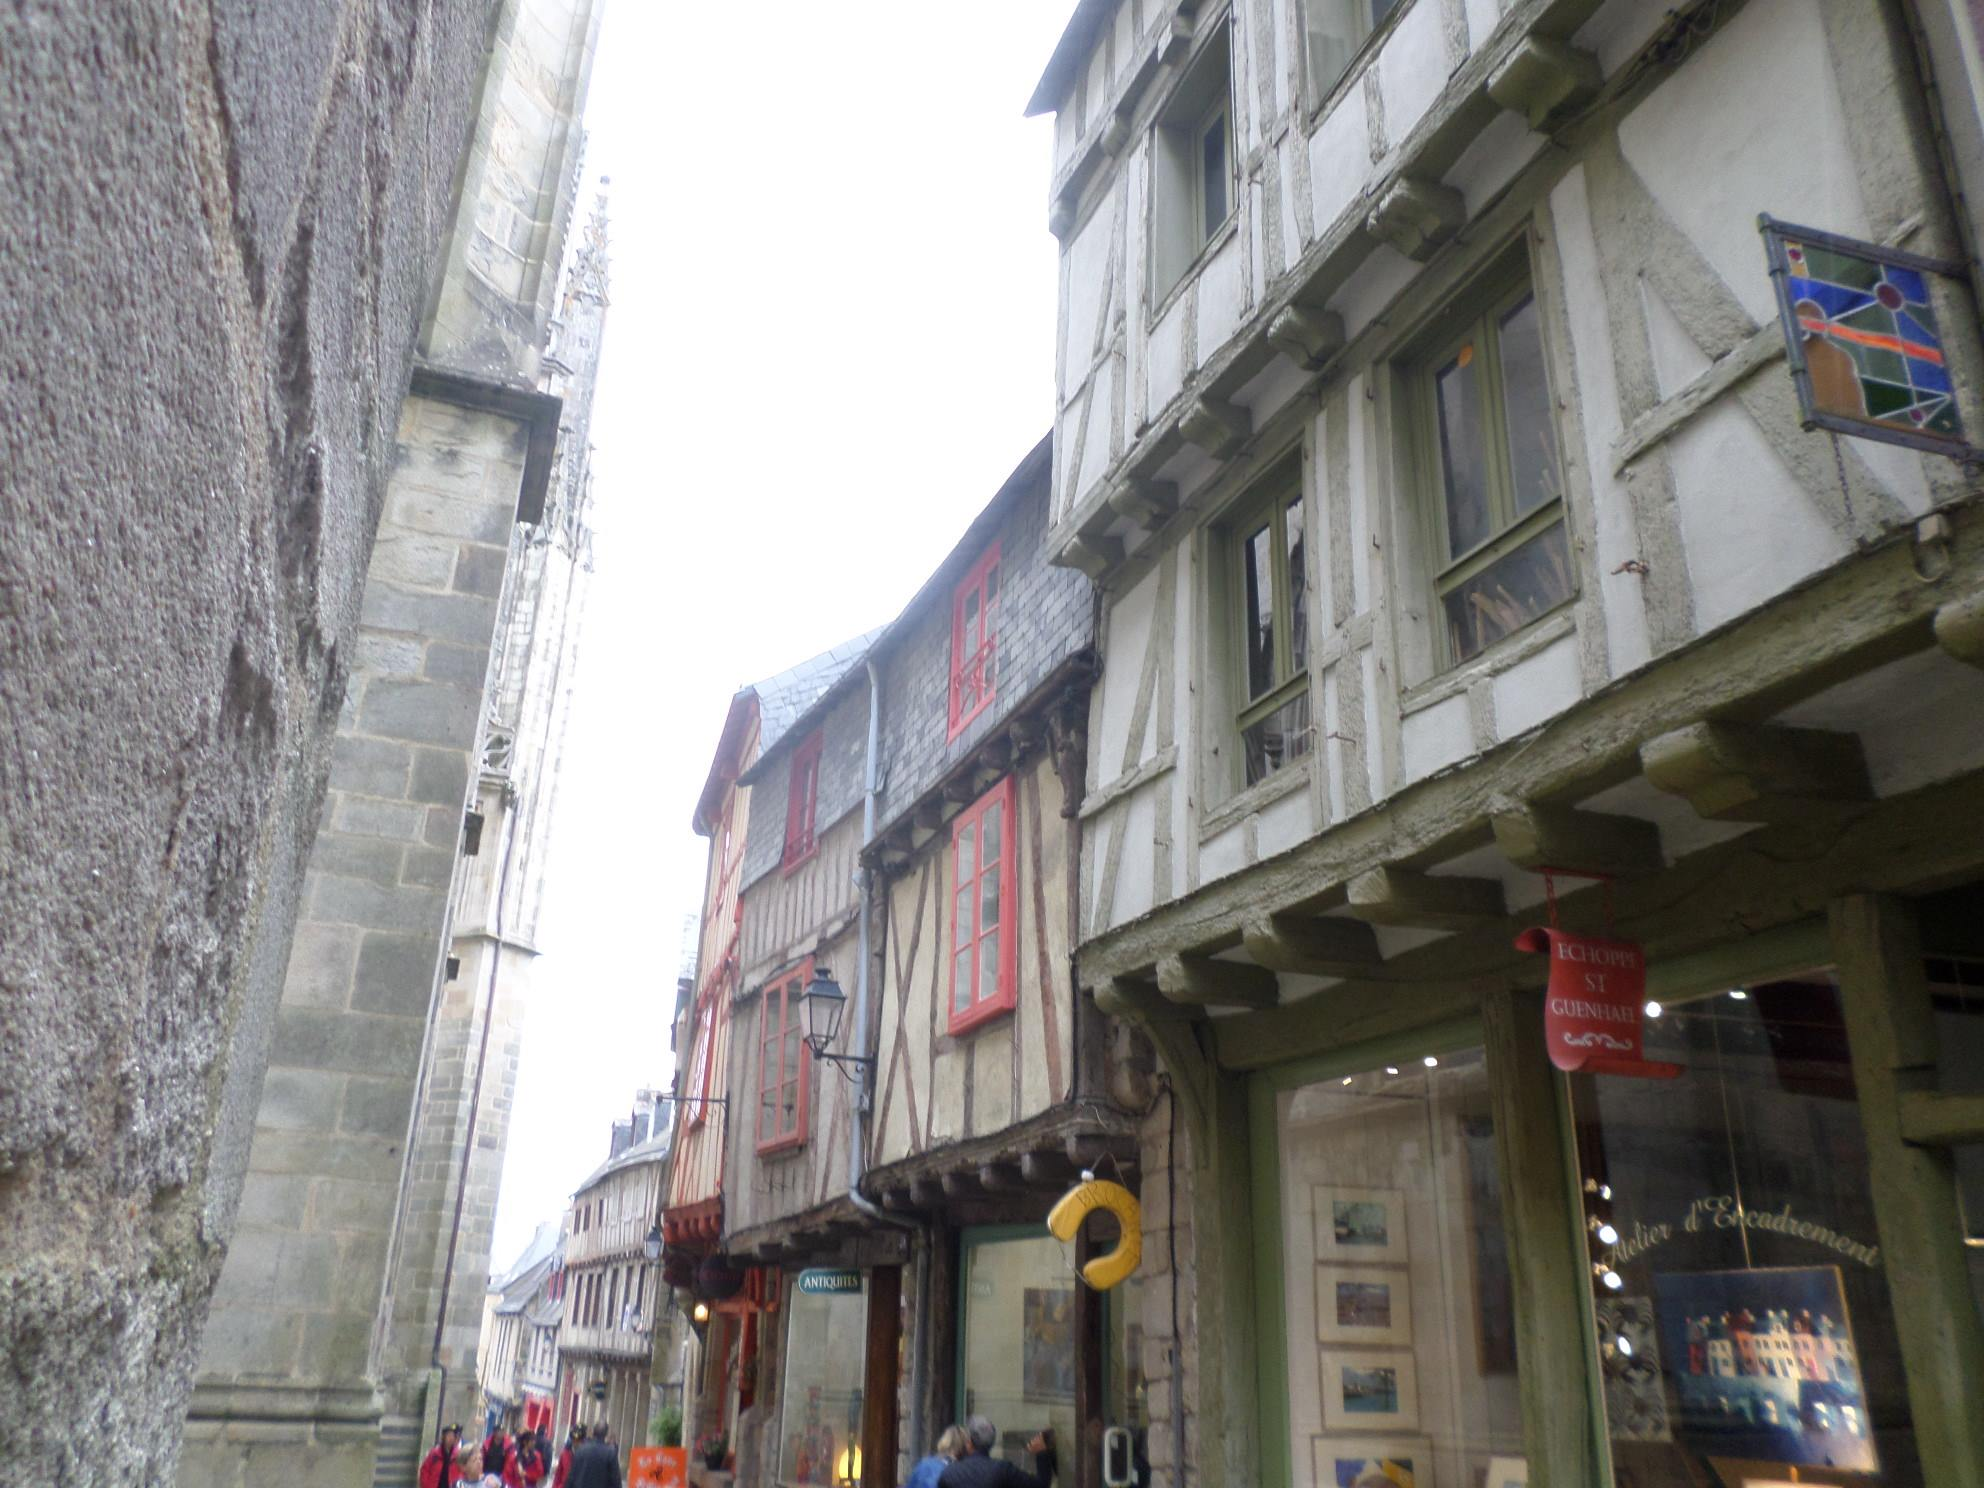 vannes rue saint gunhael side of cat st pierre 14C jul14